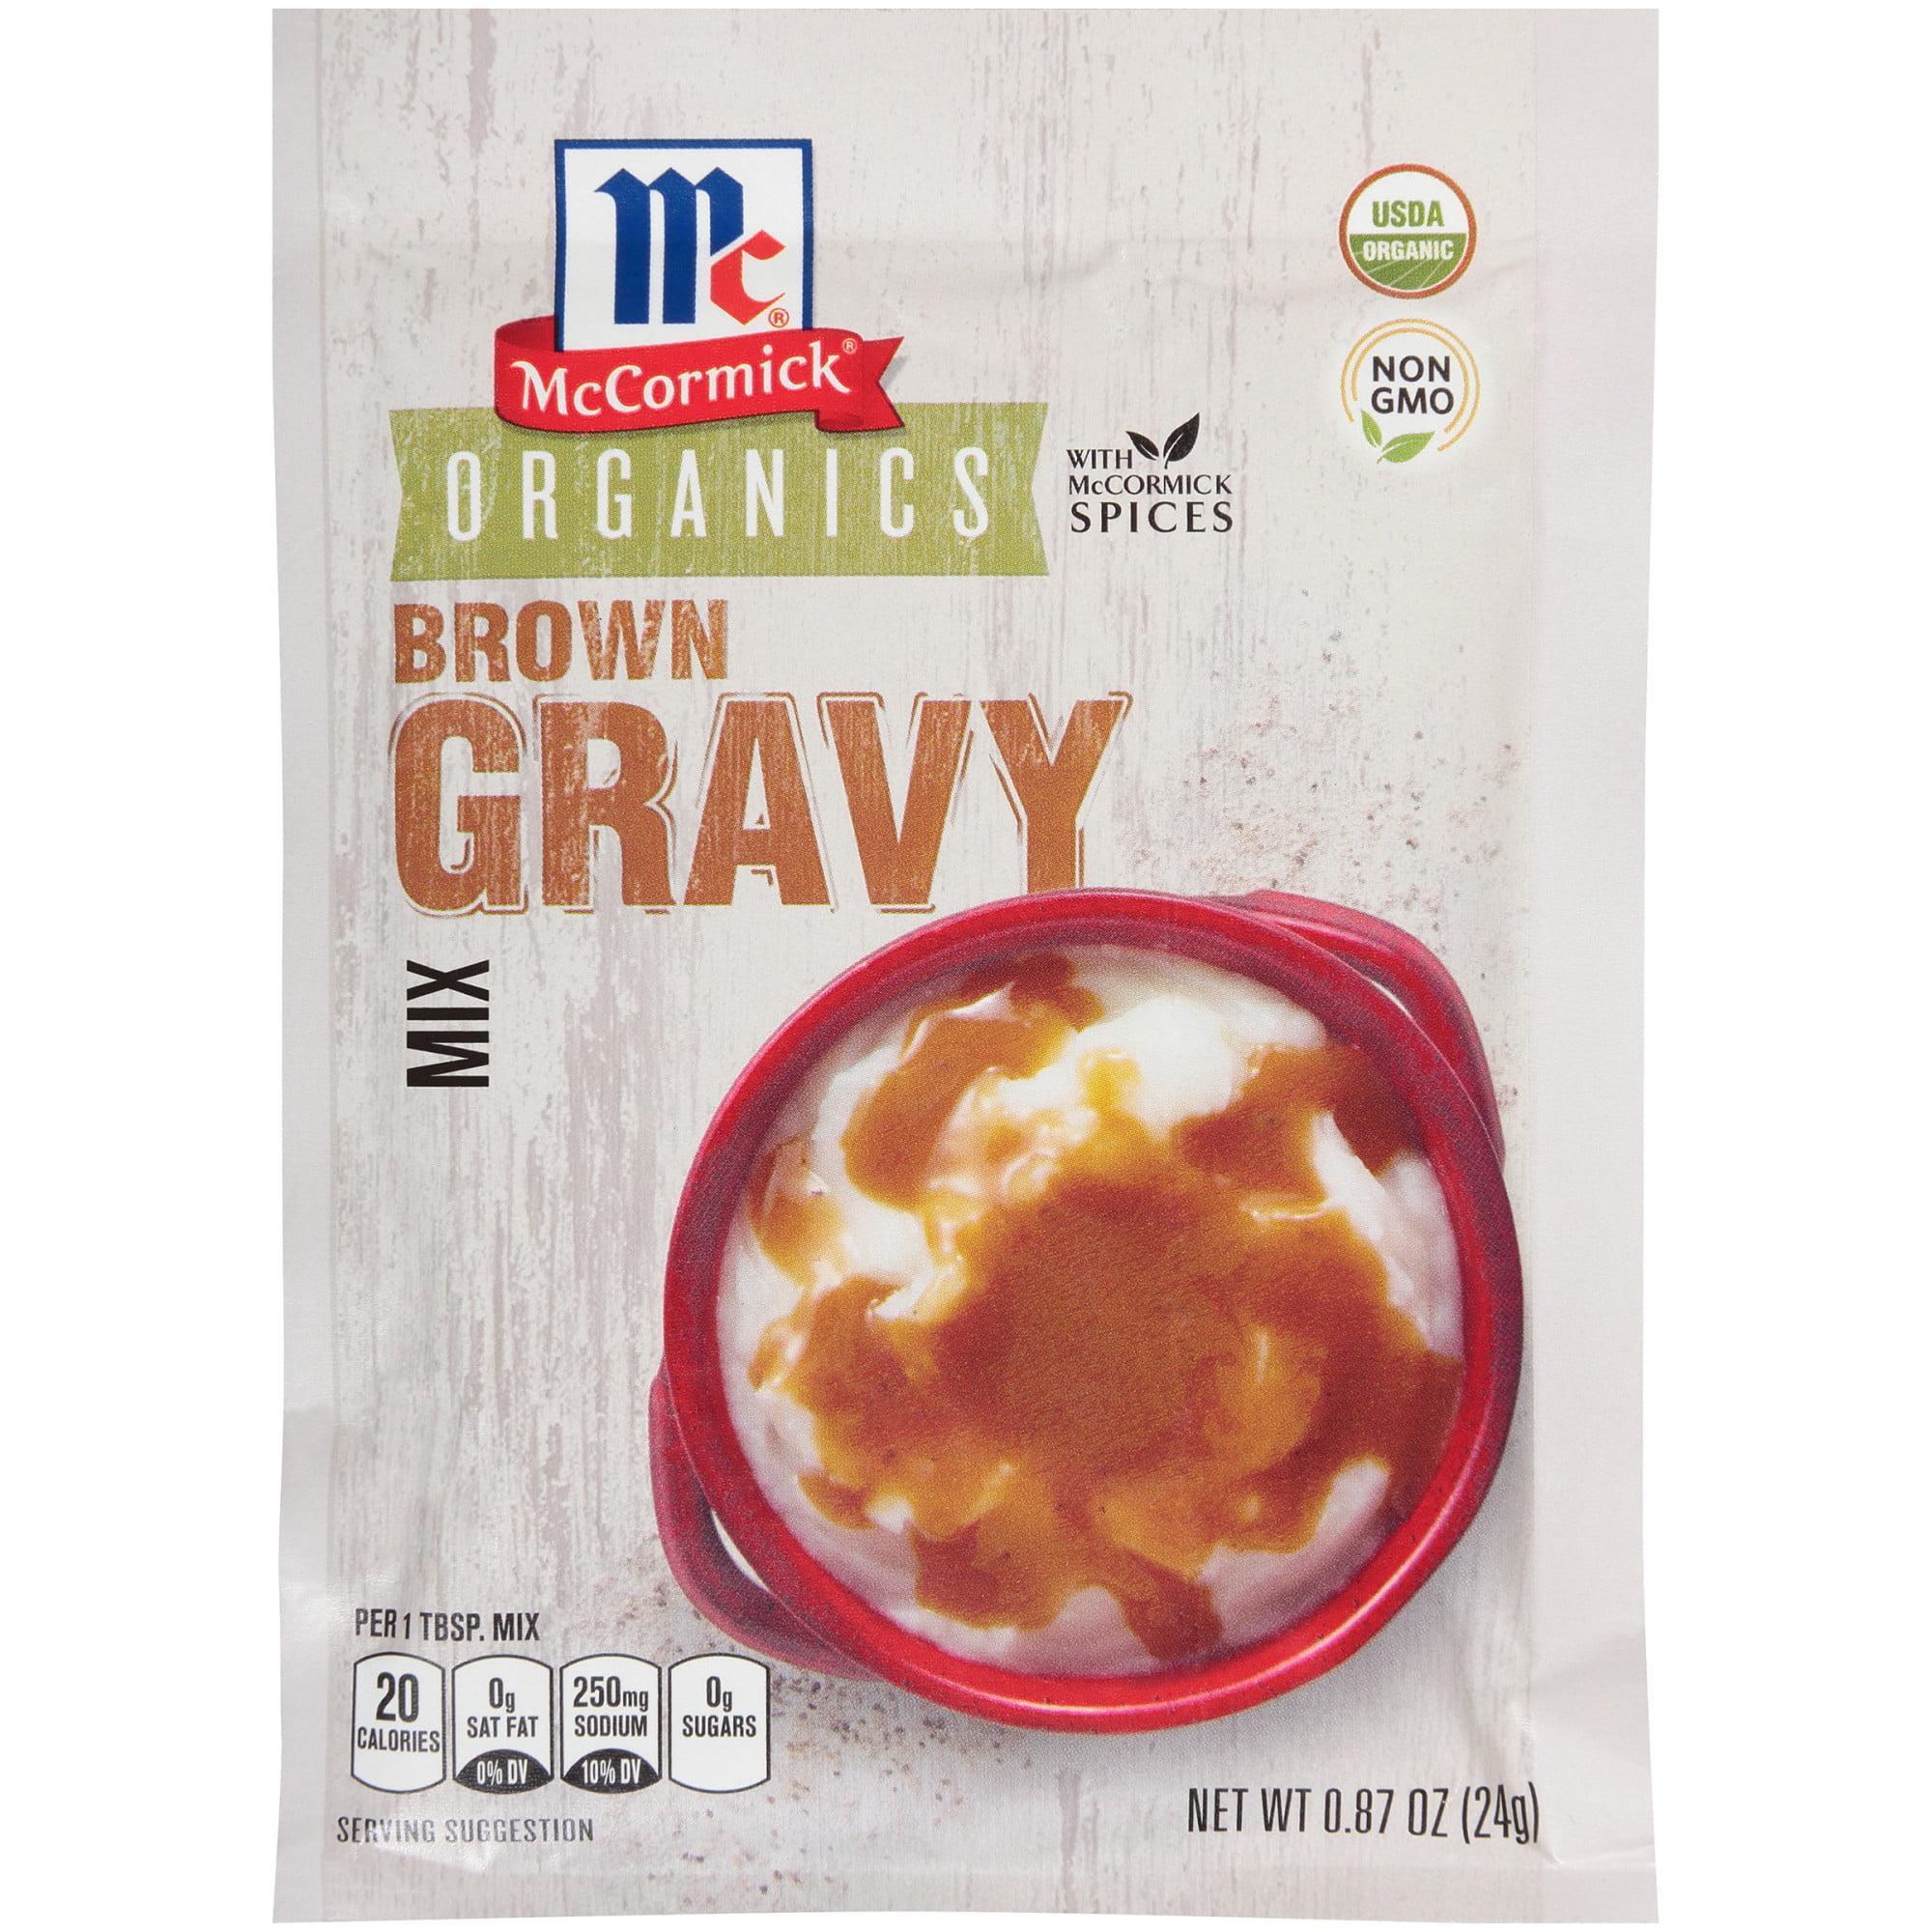 (4 Pack) McCormick Organic Brown Gravy Mix, 0.87 oz